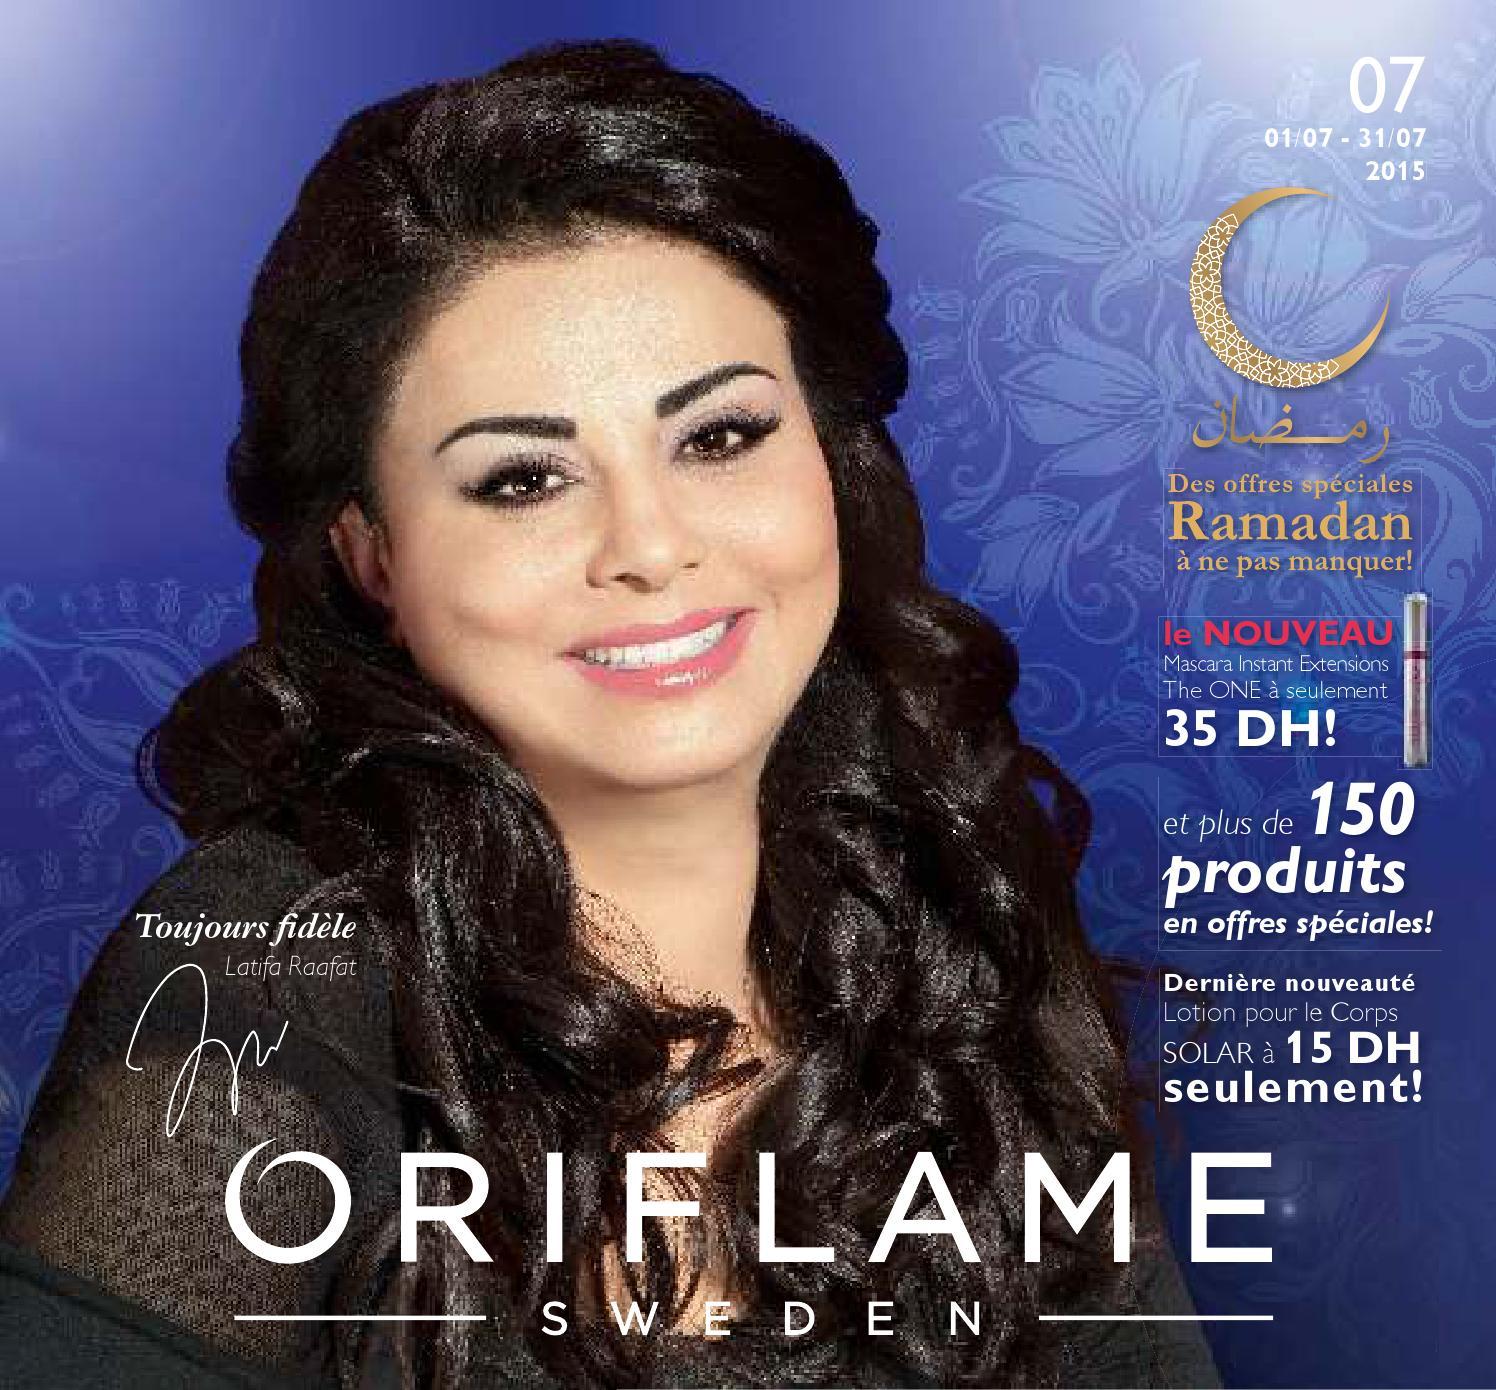 Catalogue Oriflame Maroc 07 2015 By Lb Z Issuu